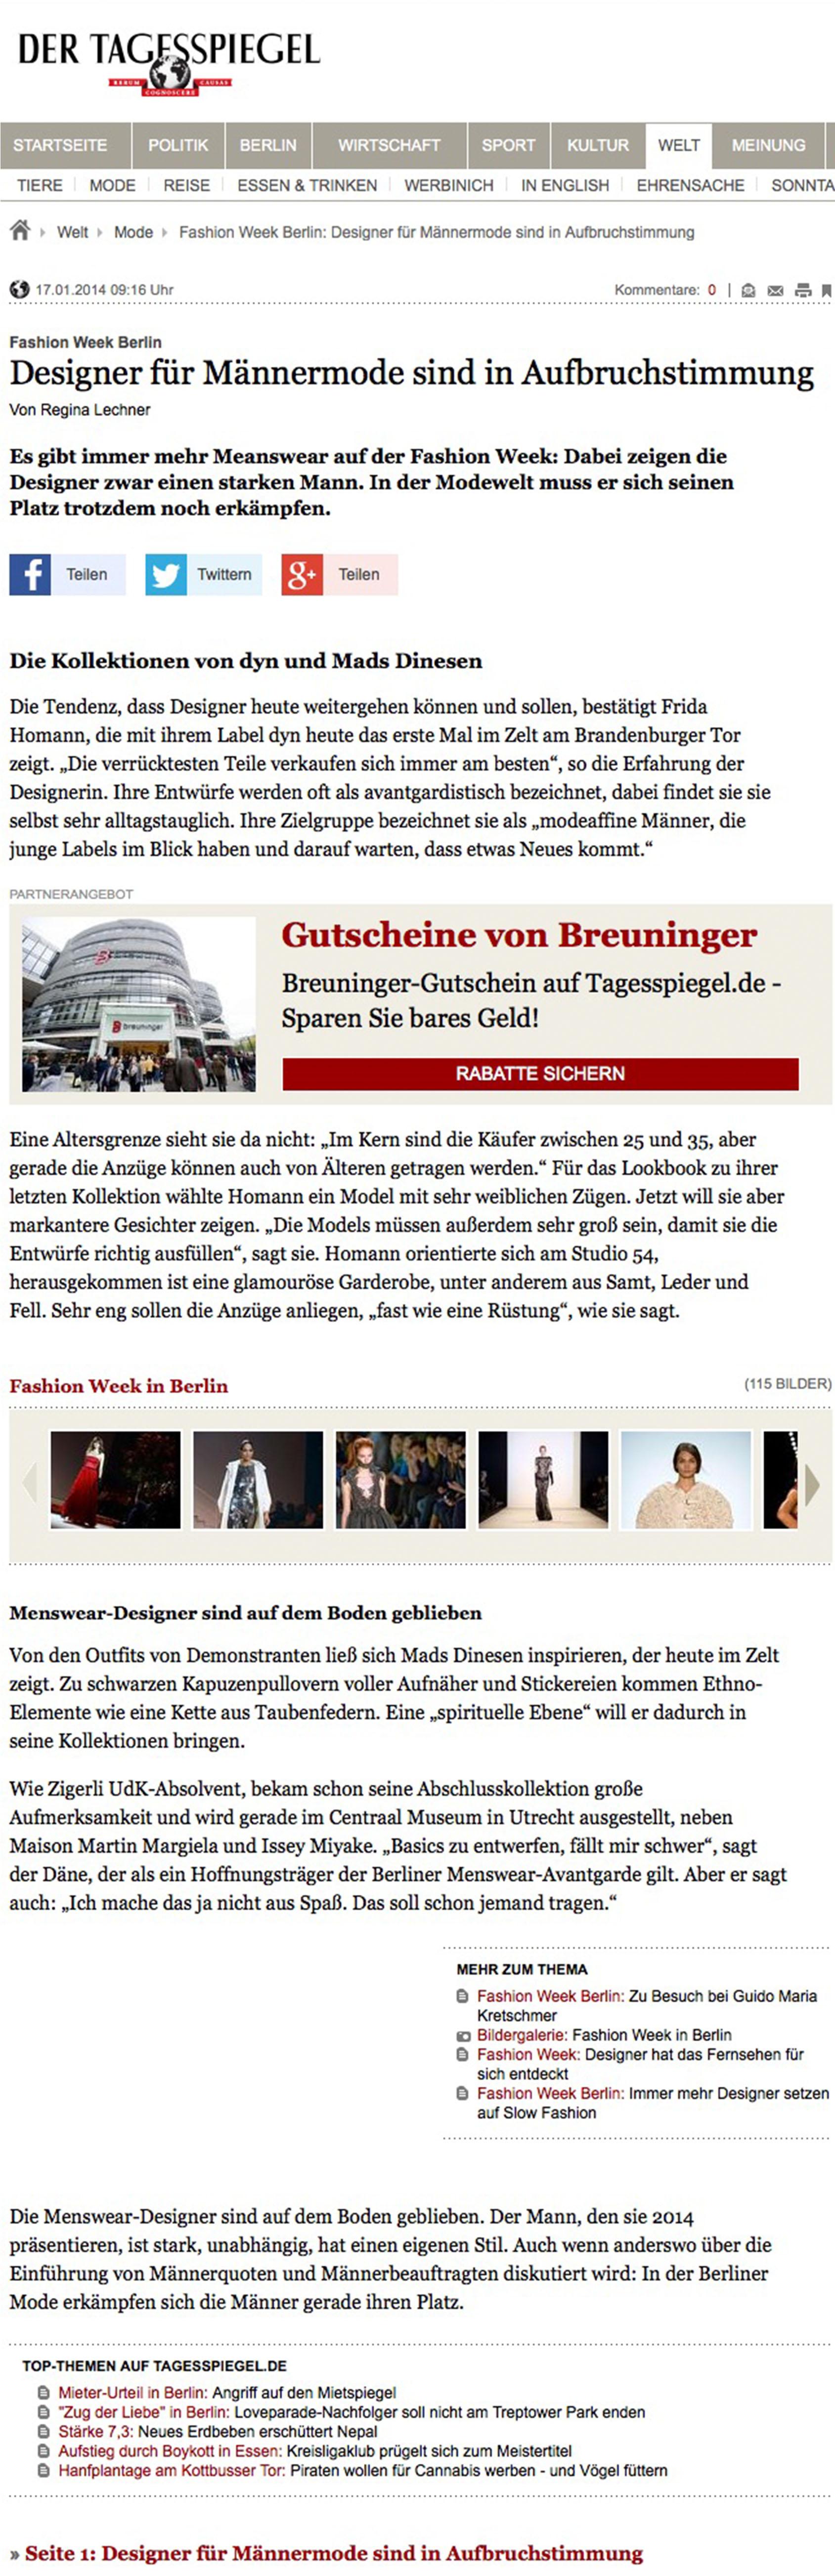 Tagesspiegel_Mads,Julian